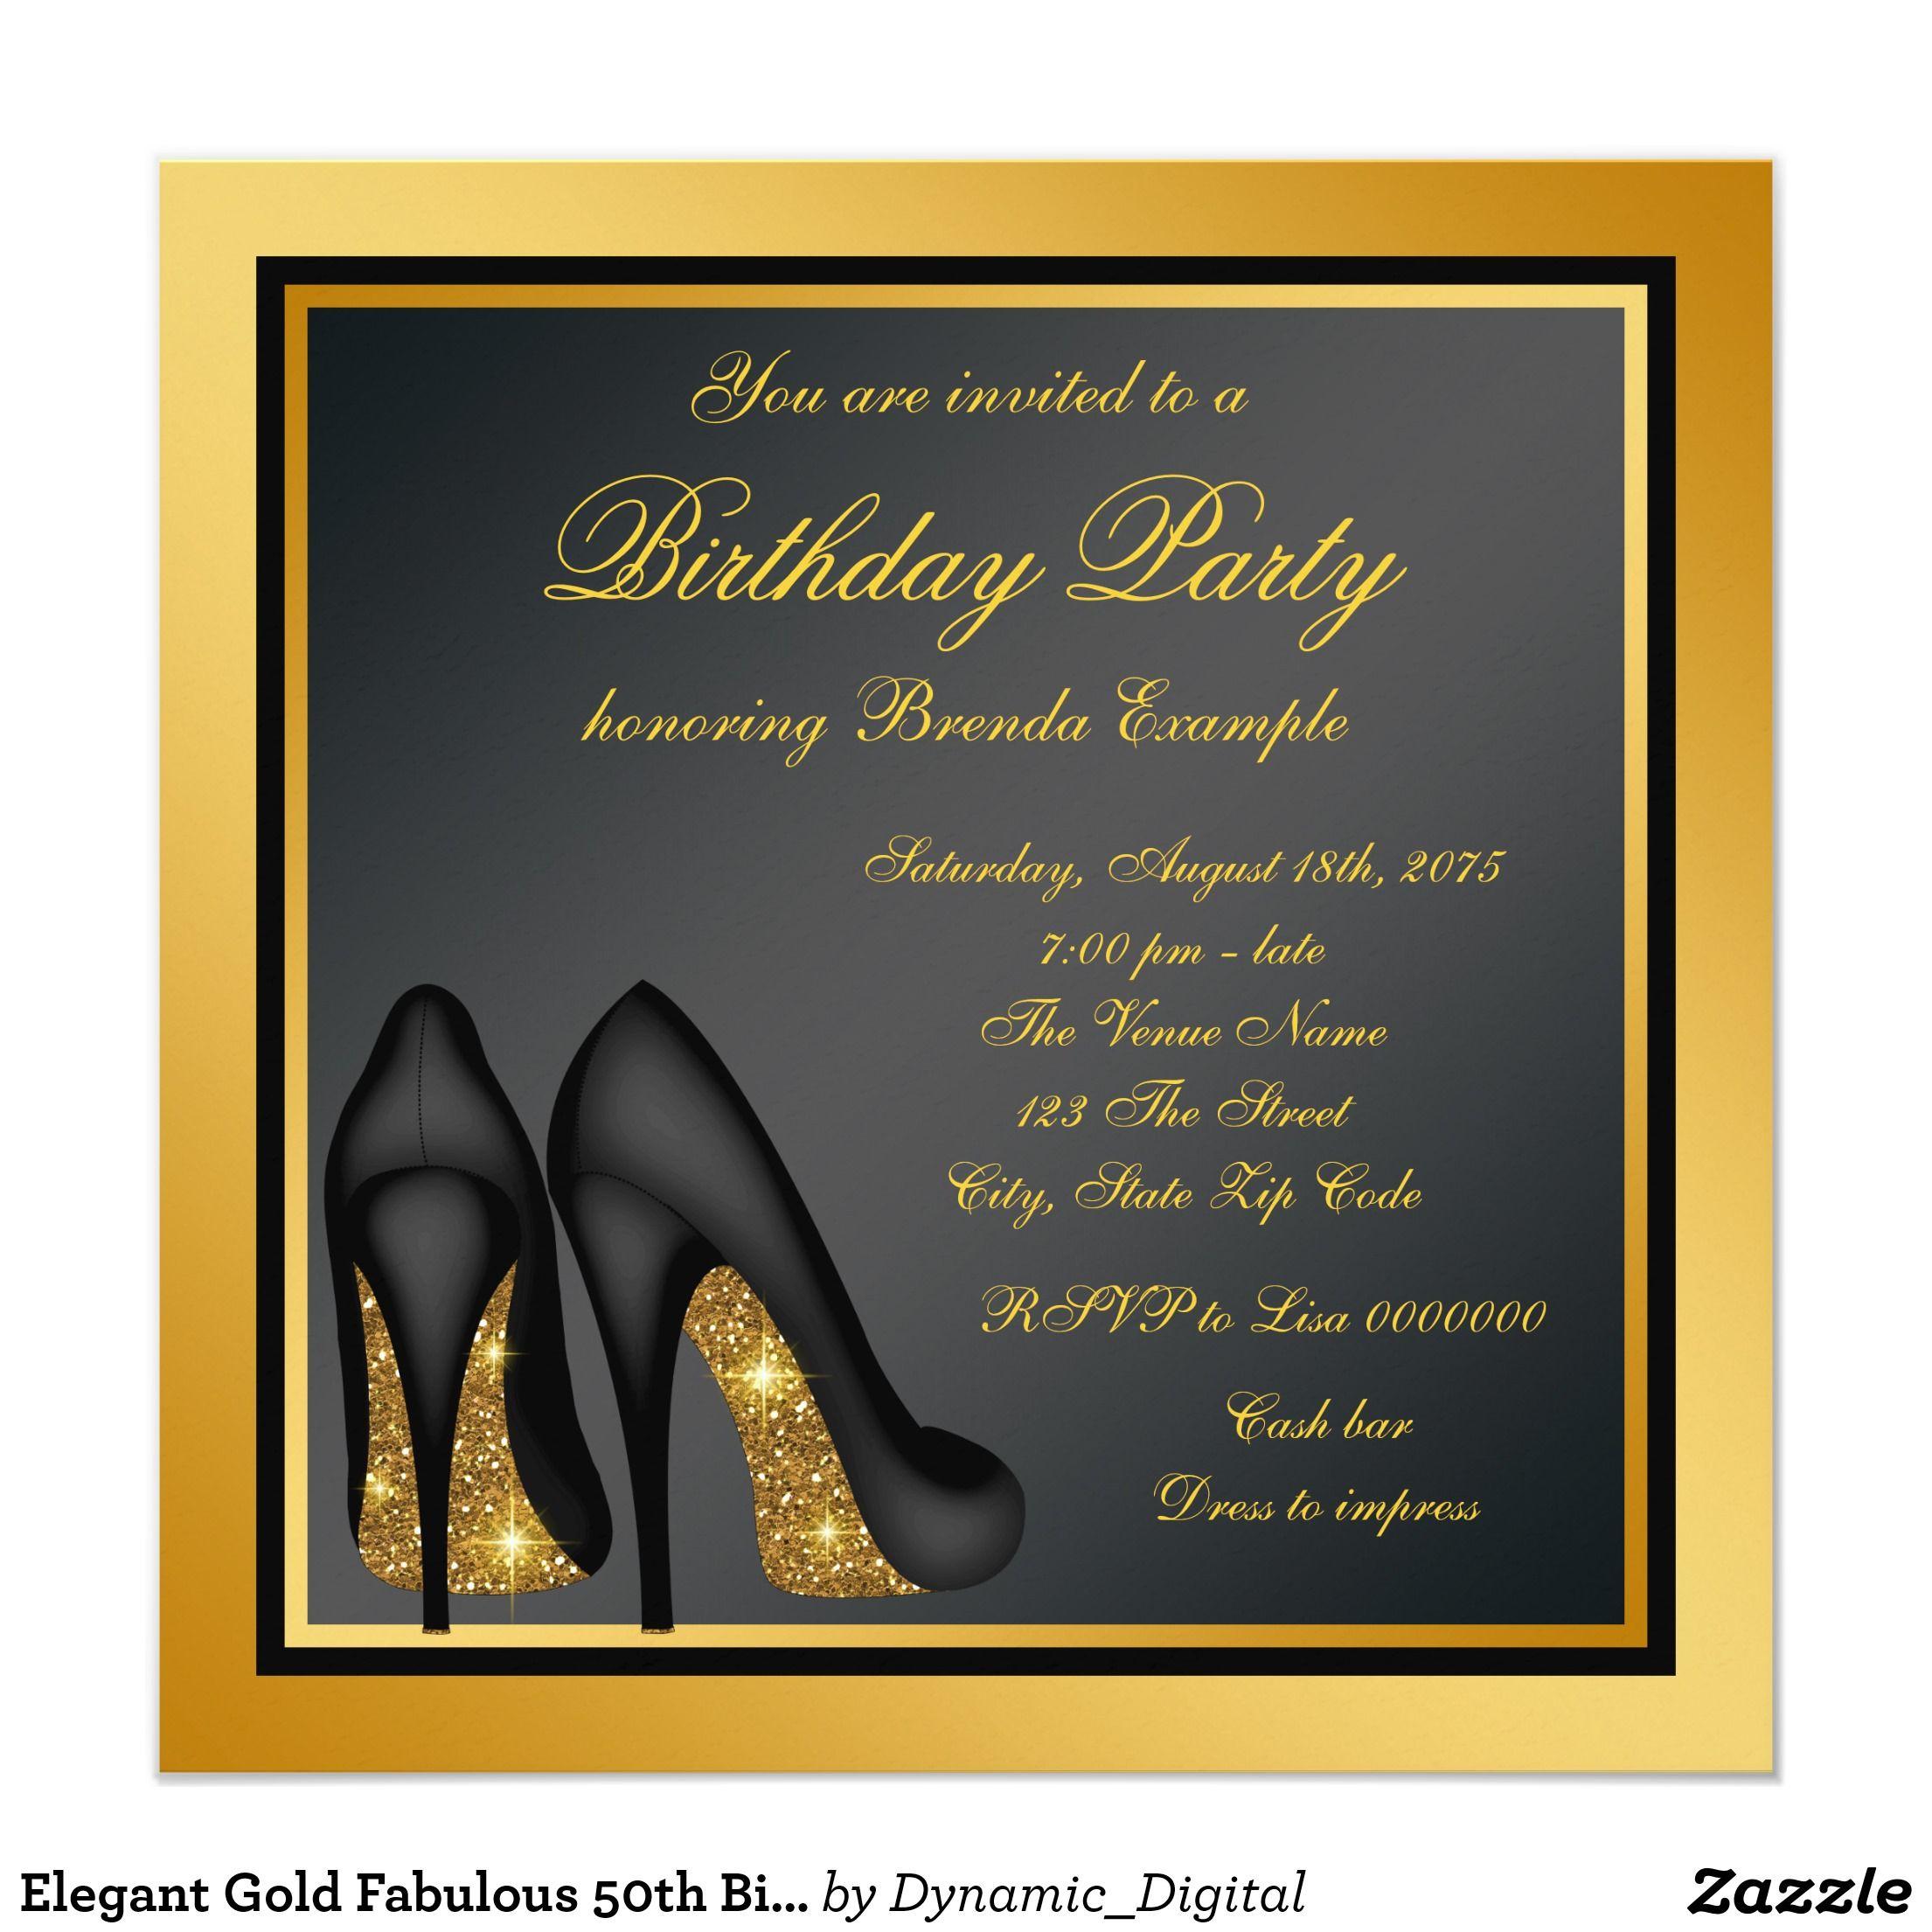 Elegant Gold Fabulous 50th Birthday Party Card | 50 birthday parties ...